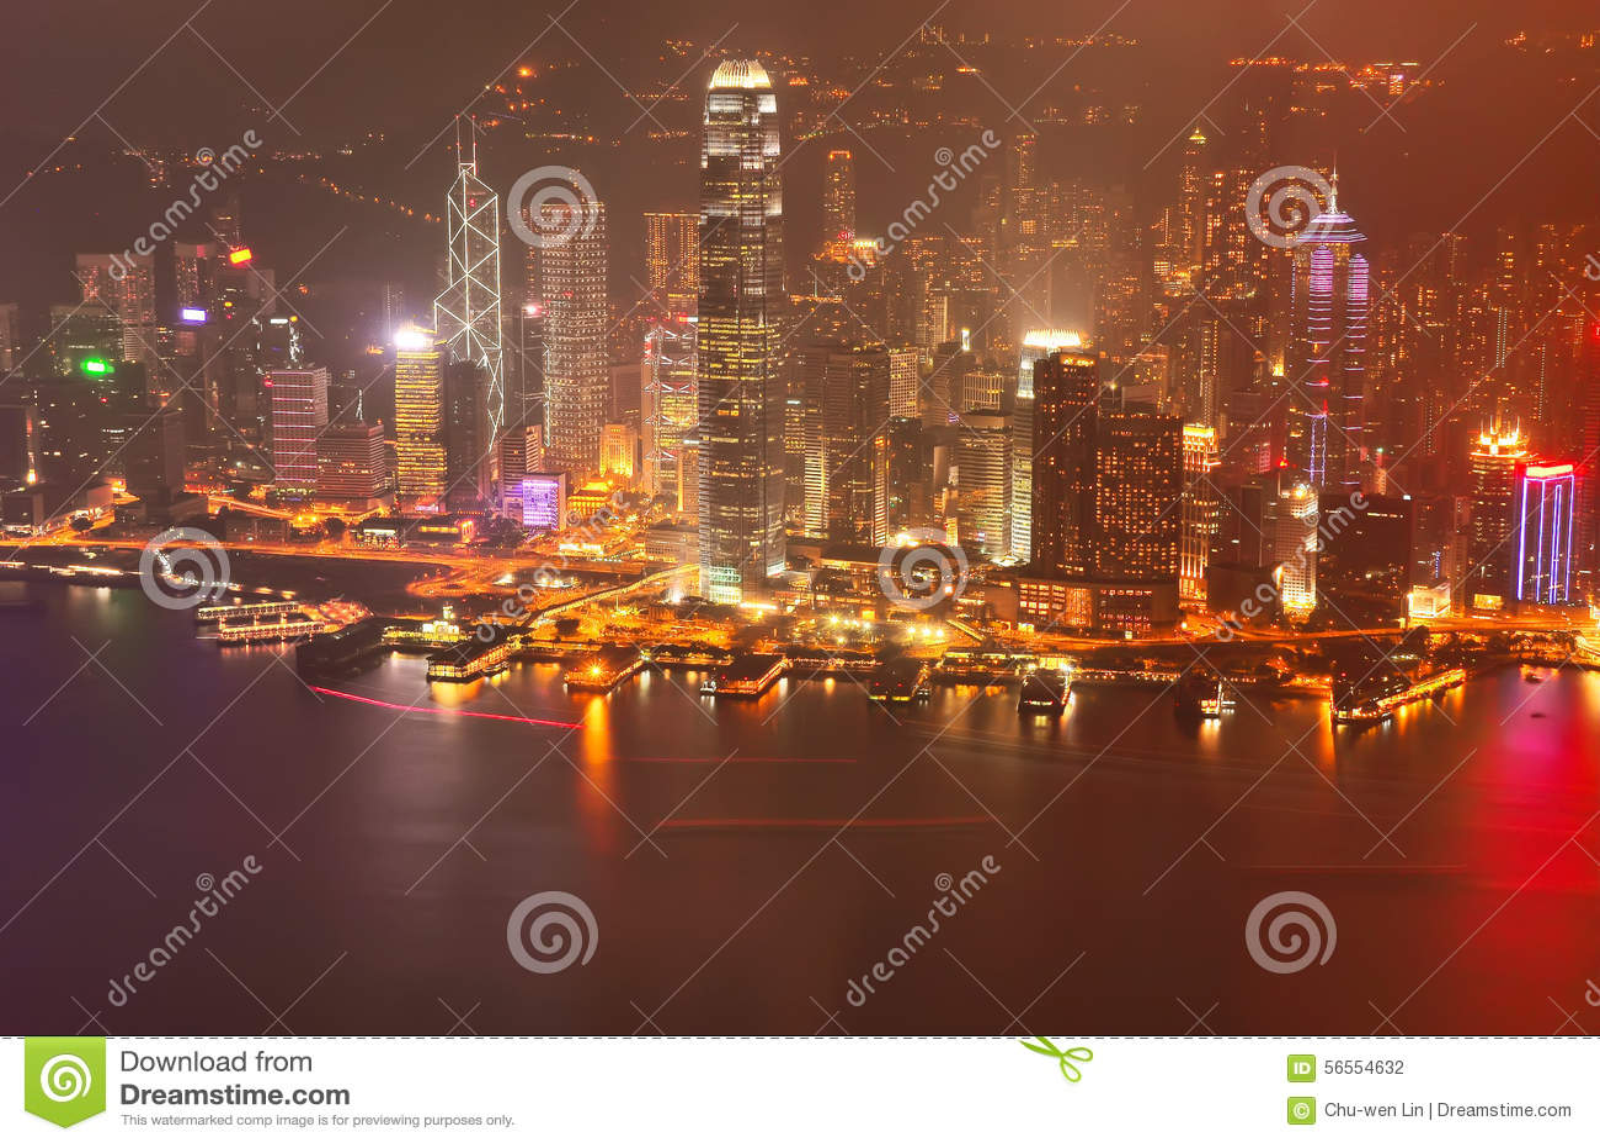 Download Λιμάνι Βικτώριας και ορίζοντας Χονγκ Κονγκ Στοκ Εικόνες - εικόνα από αποβάθρα, πανοραμικός: 56554632